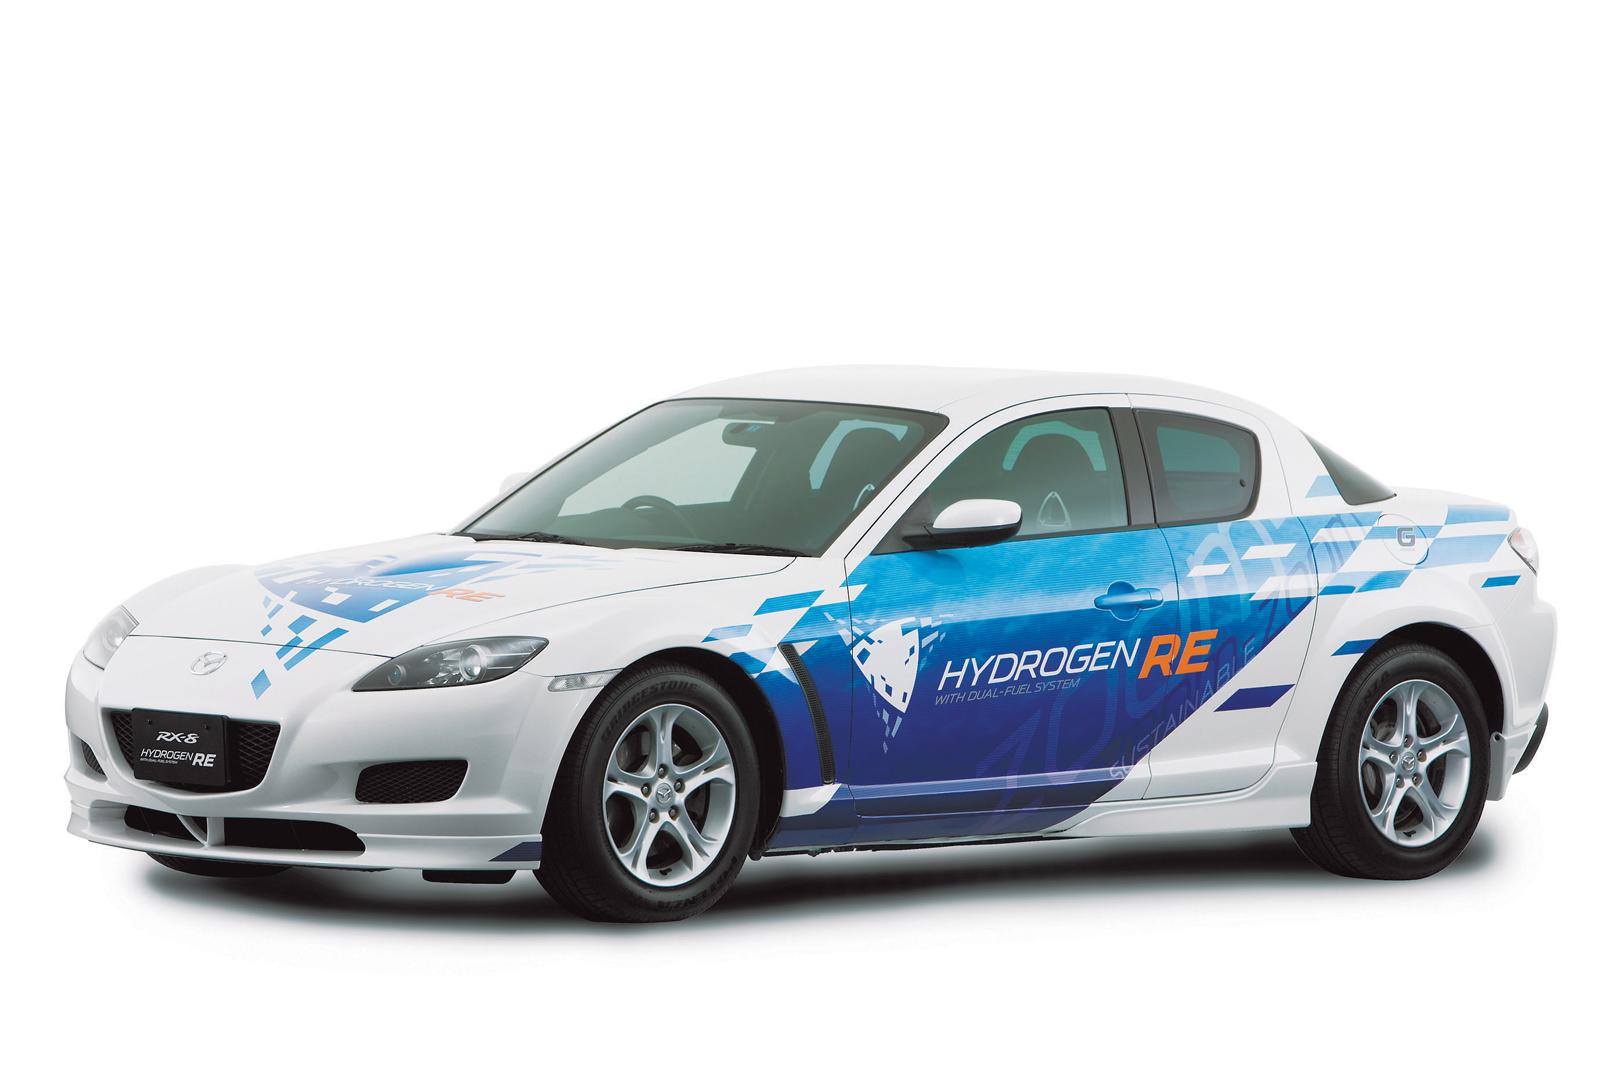 Mazda RX 8 Hydrogen RE & Mazda Premacy Hydrogen RE Hybrid - Picture ...